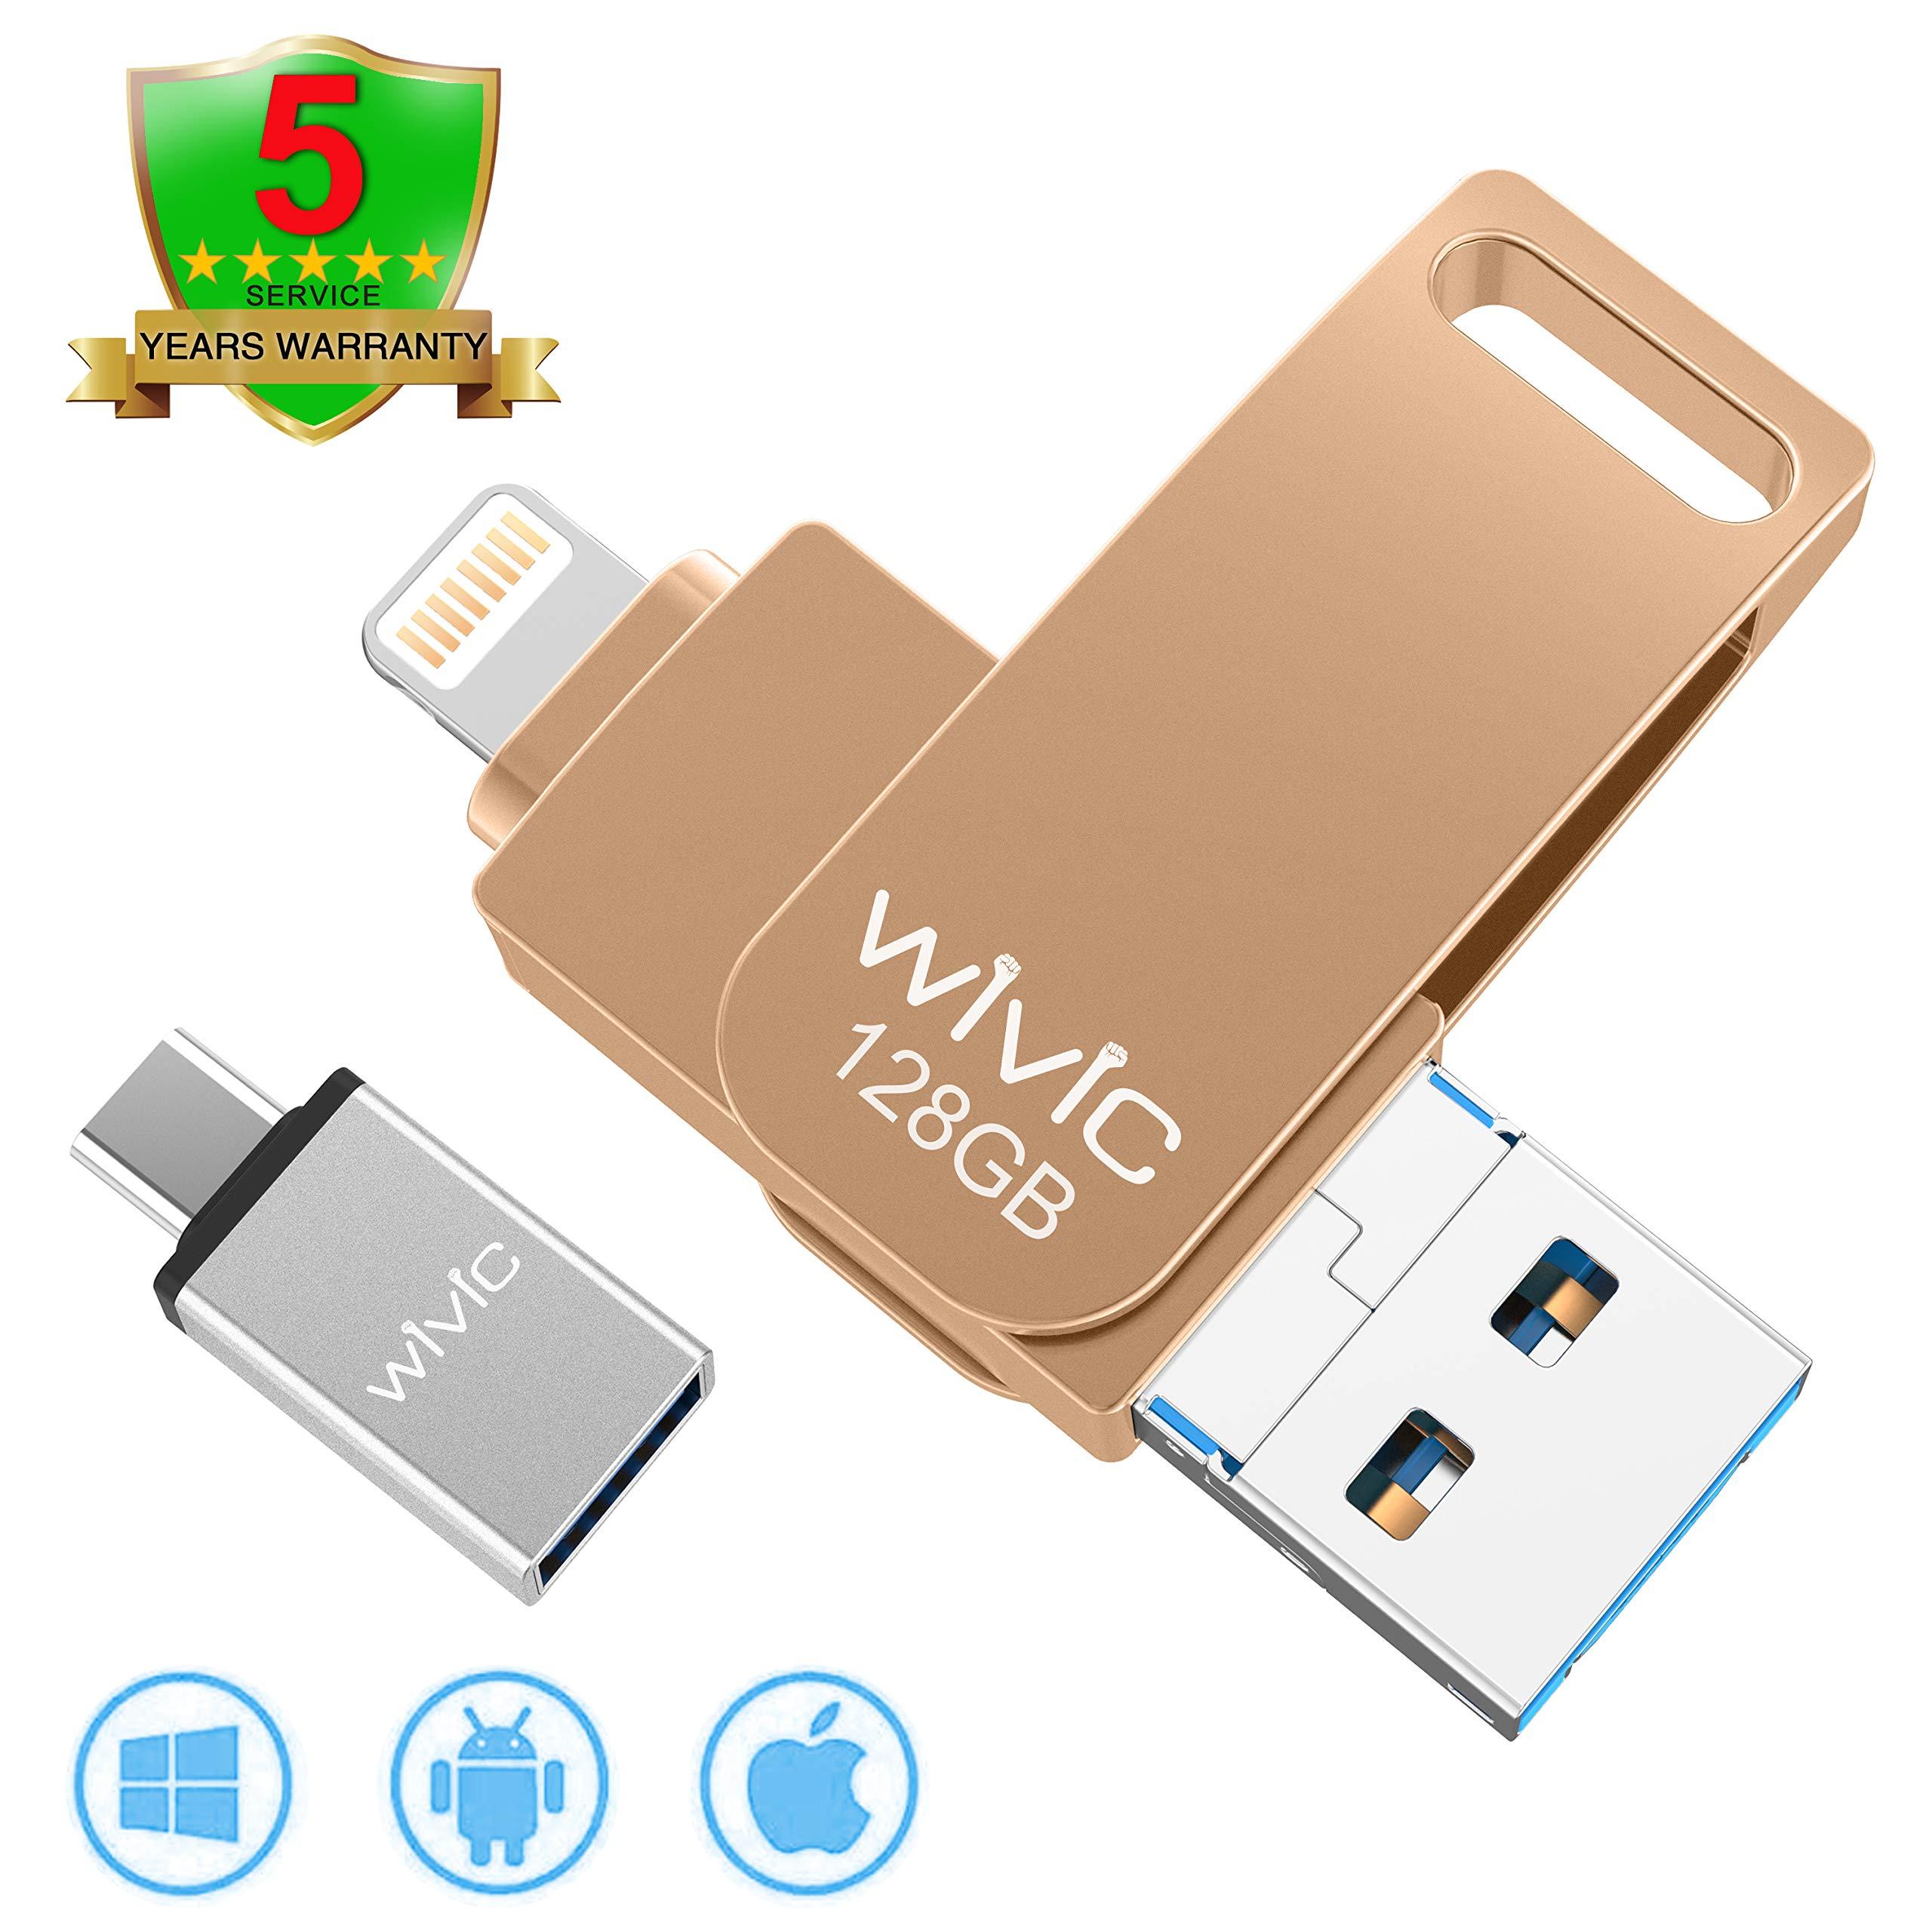 USB Flash Drive Photo Stick for iPhone Flash Drive for iPhone PhotoStick Mobile for iPhone USB Flash Drive Android Backup Drive OTG Smart Phone Memory Stick Storage iPAD USB 3.0 WIVIC 128GB Gold